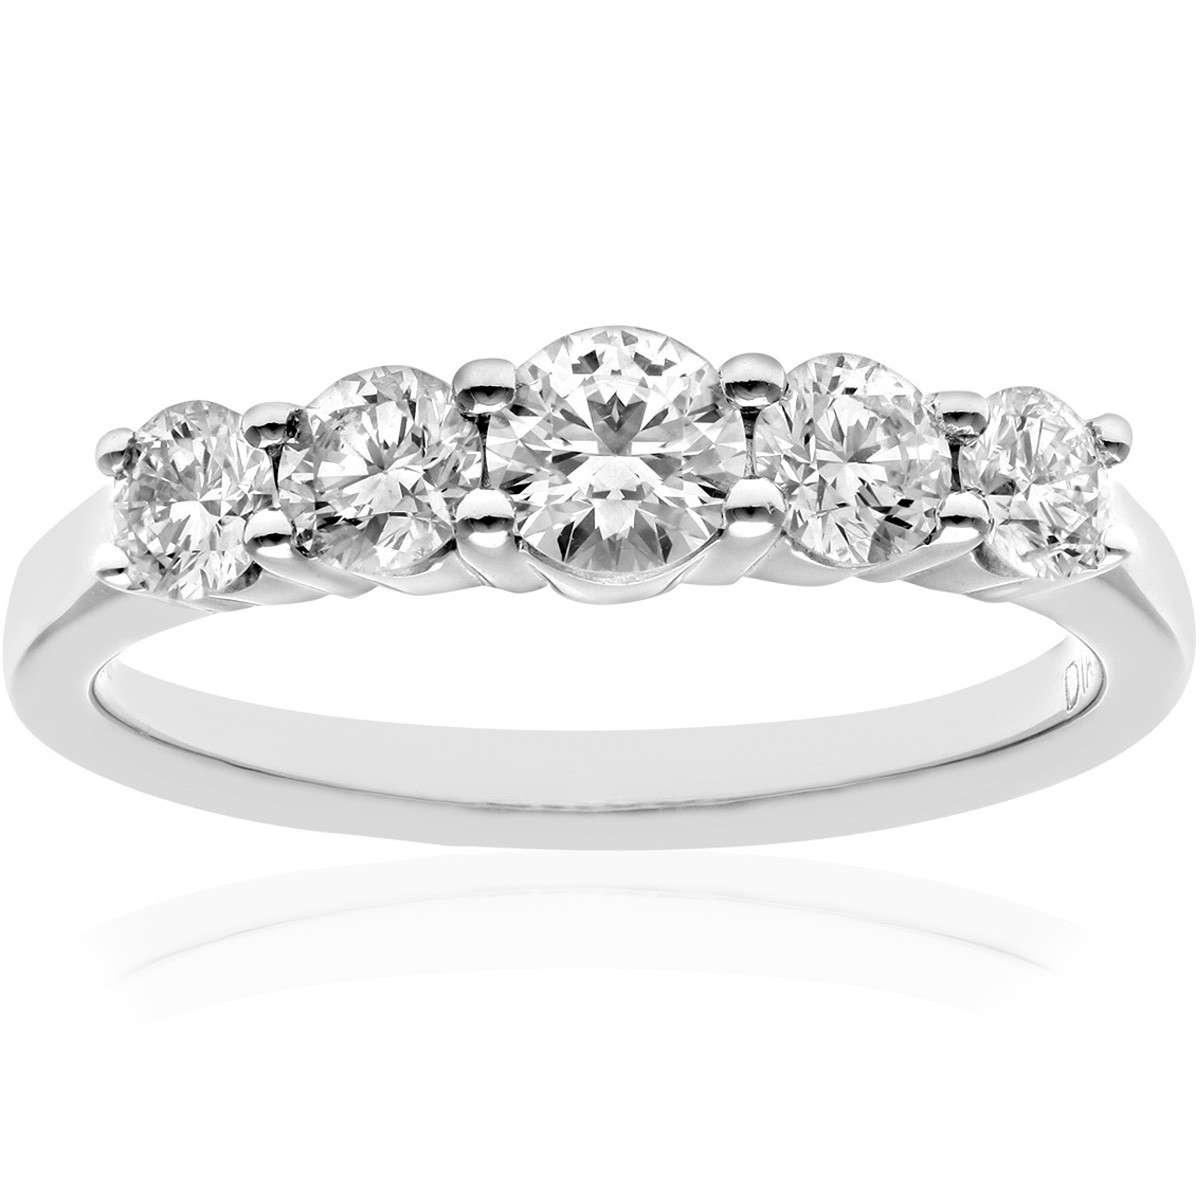 18CT WHITE GOLD 1.00CT DIAMOND 5 STONE GRADUATE ETERNITY RING